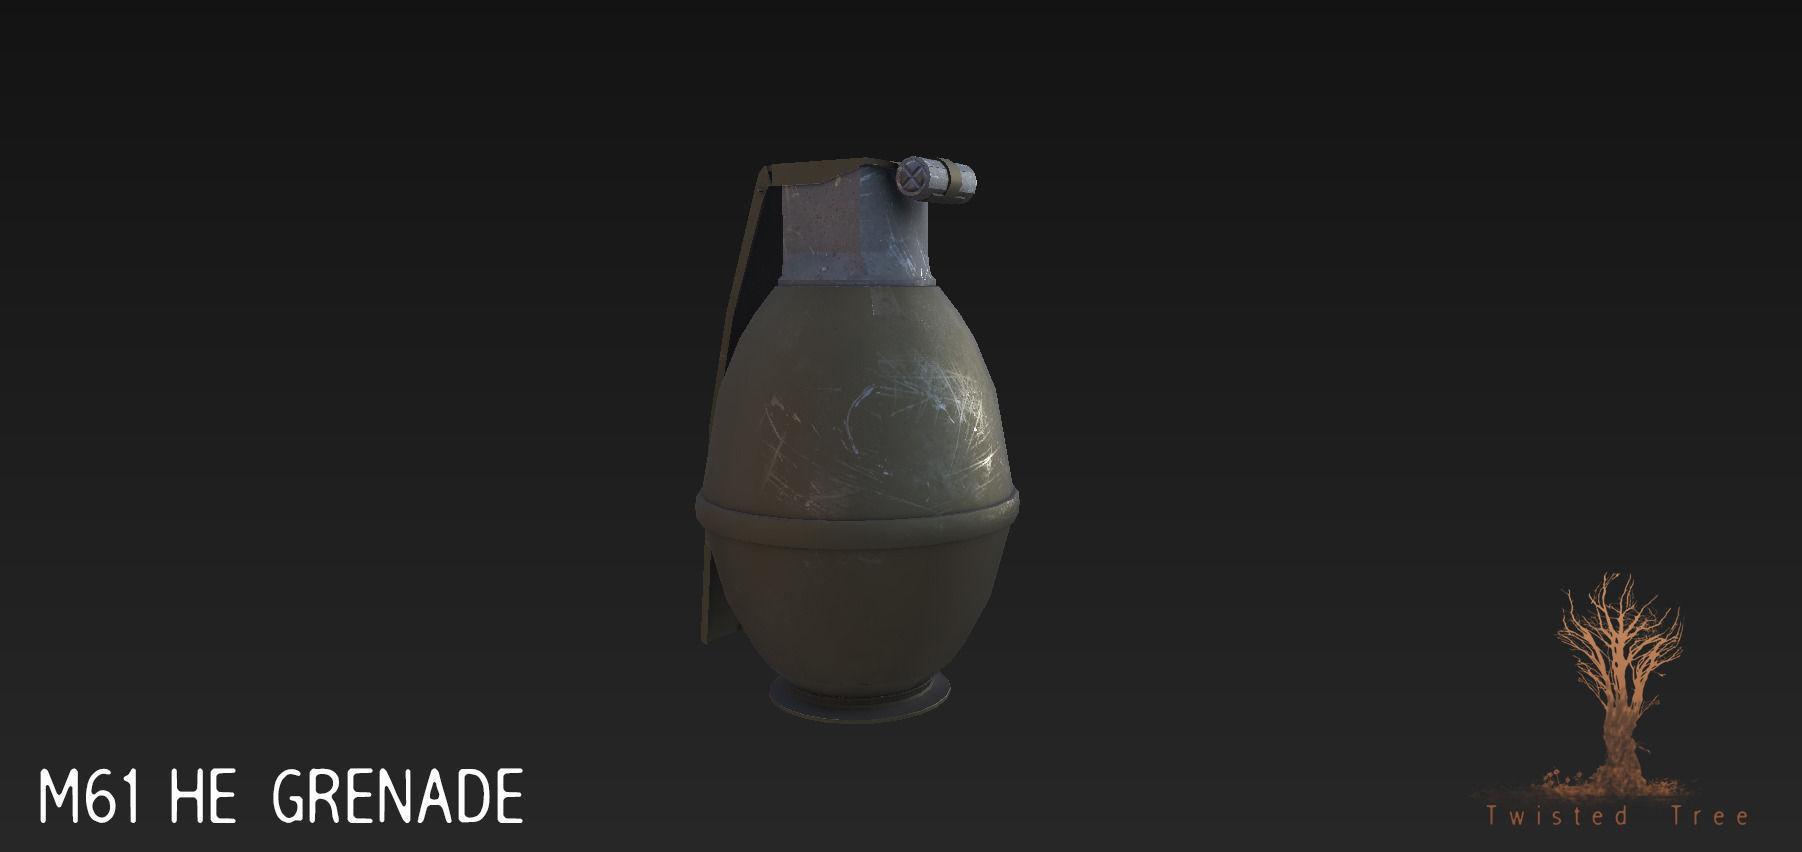 m61 grenade - photo #45